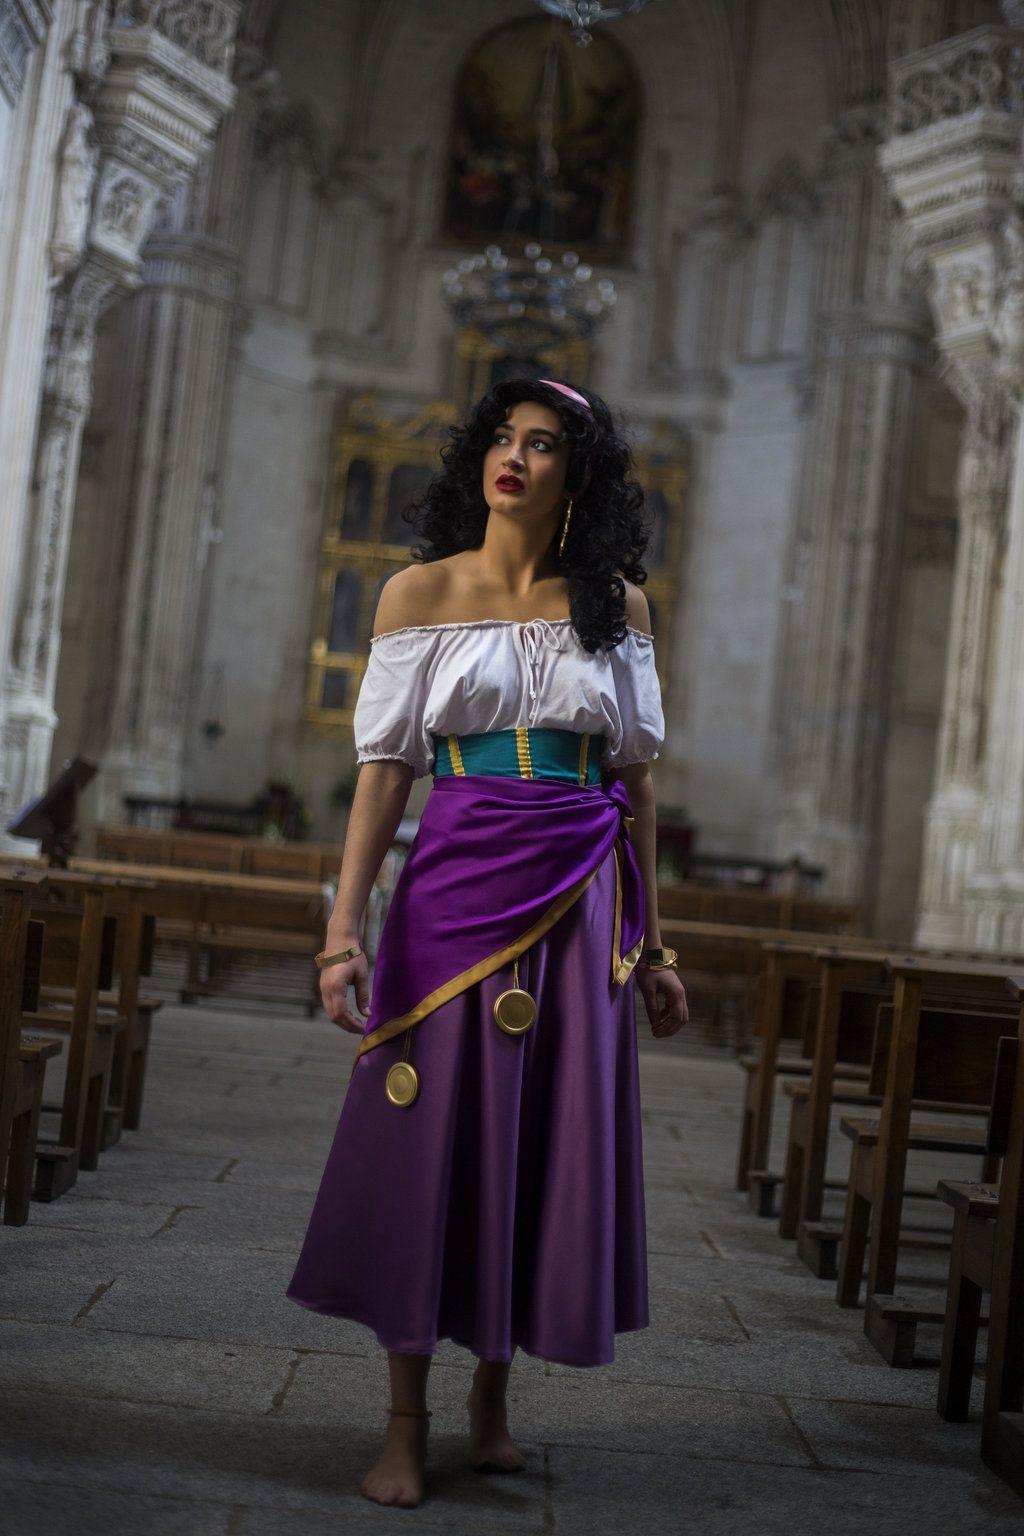 Costume Halloween Esmeralda.Pin By Zoe Brocklehurst On Fancy Dress Esmeralda Cosplay Disney